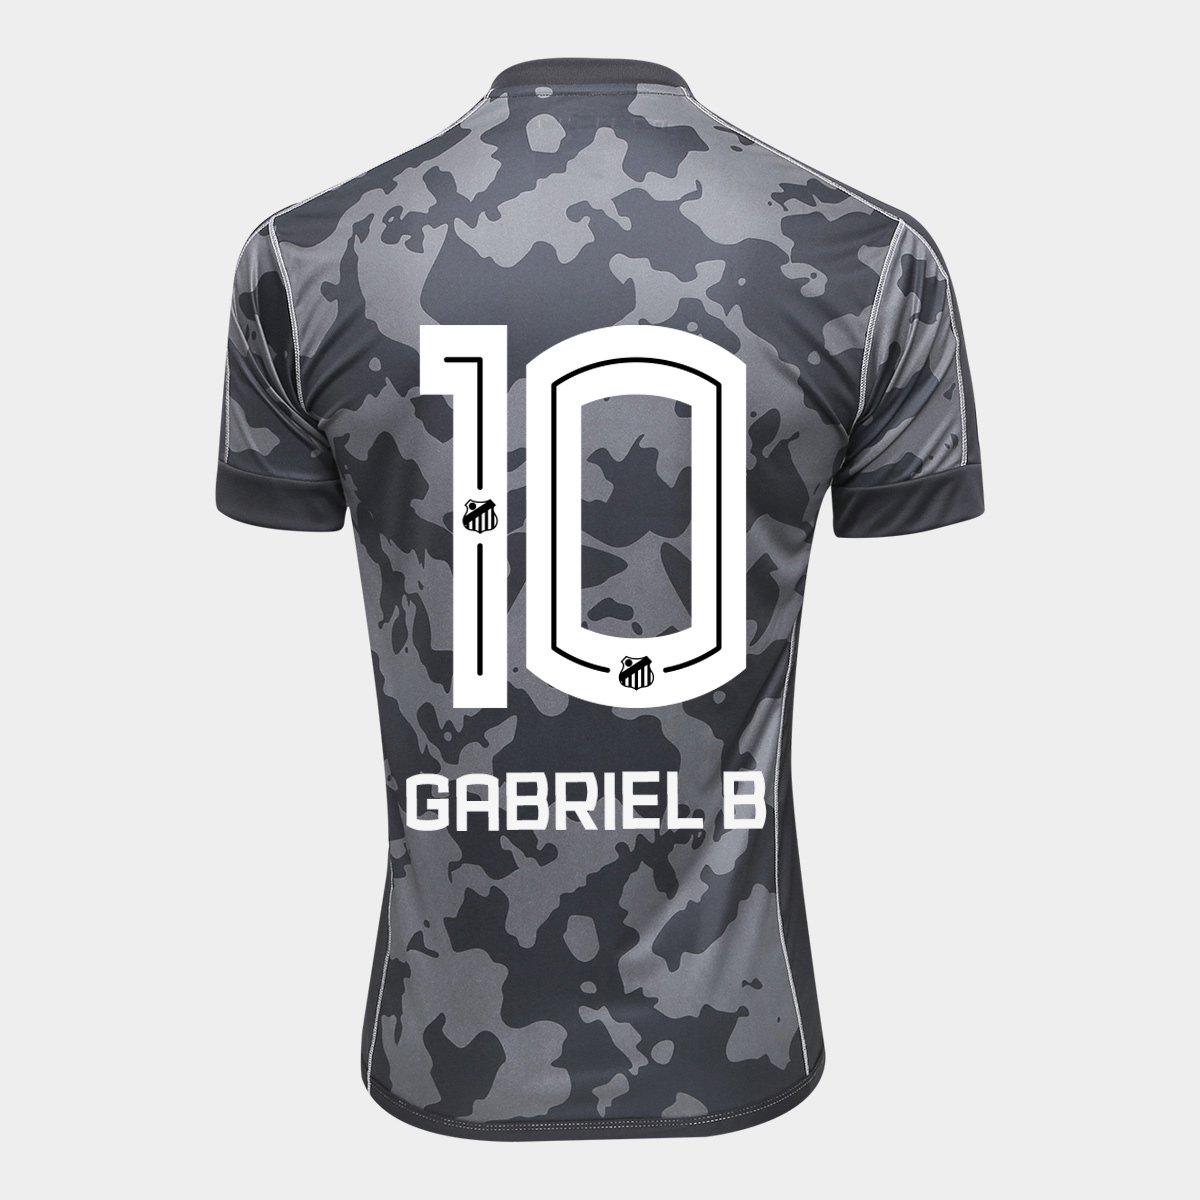 Camisa Santos III 17 18 nº 10 Gabriel B - Torcedor Kappa Masculina - Compre  Agora  79c7bf1b97b83